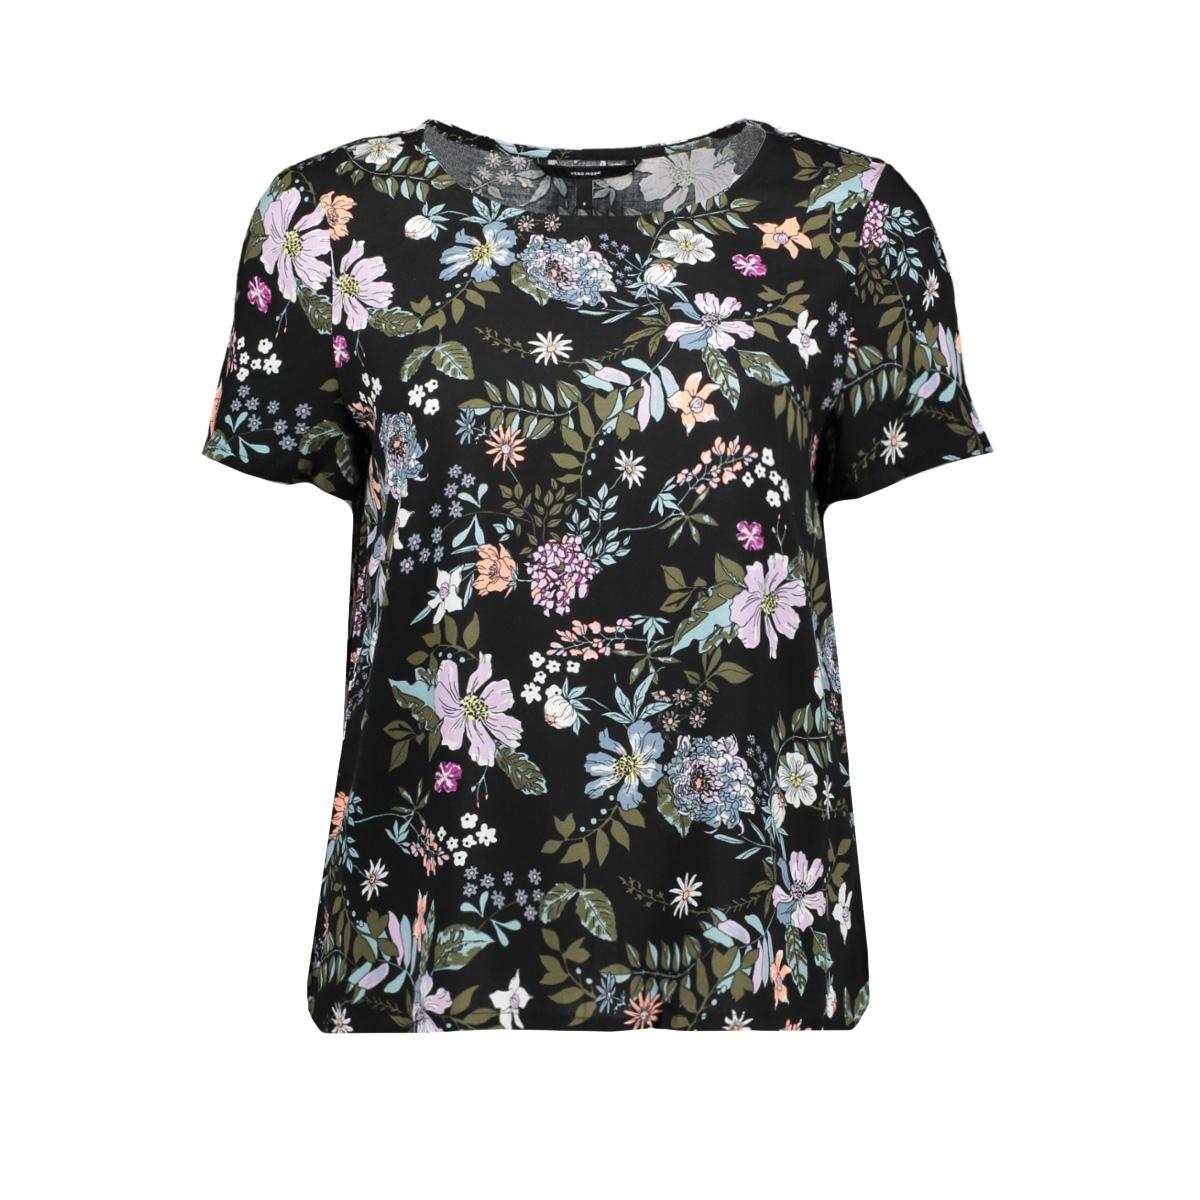 vmsimply easy ss top 10211480 vero moda t-shirt black/isa